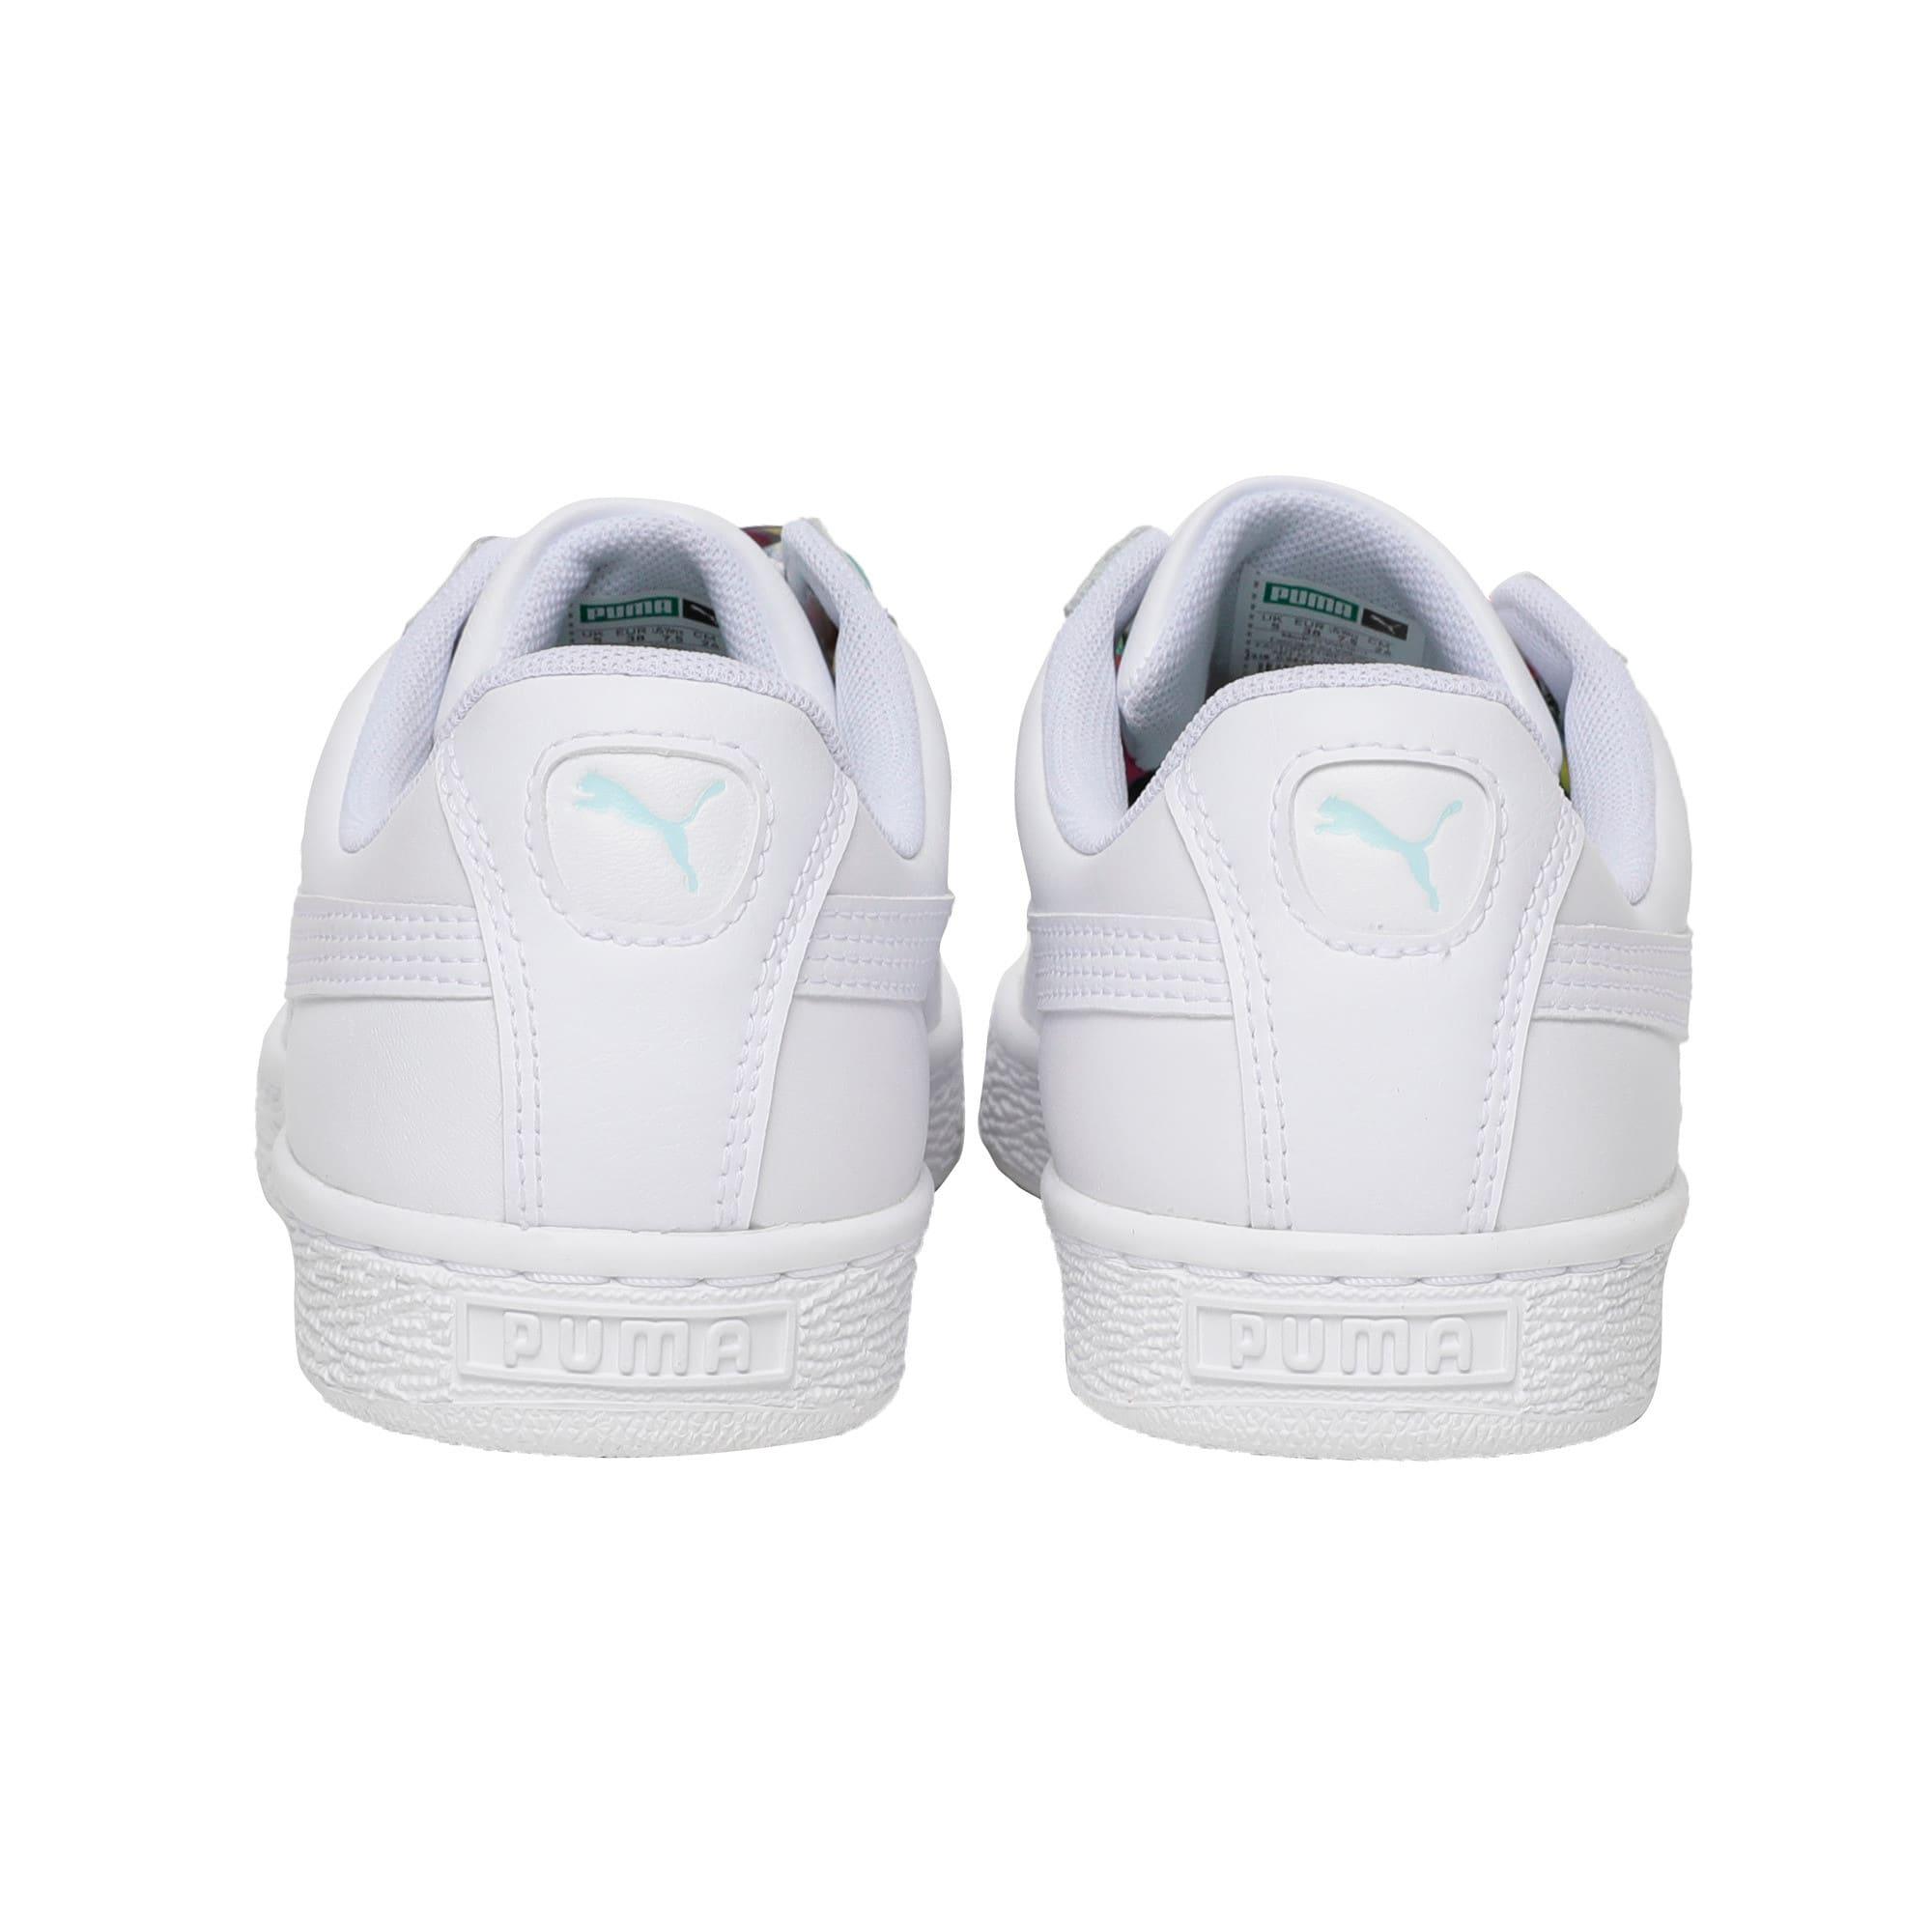 Thumbnail 4 of Basket Heart Gen Hustle Women's Sneakers, Puma White-Fair Aqua, medium-IND